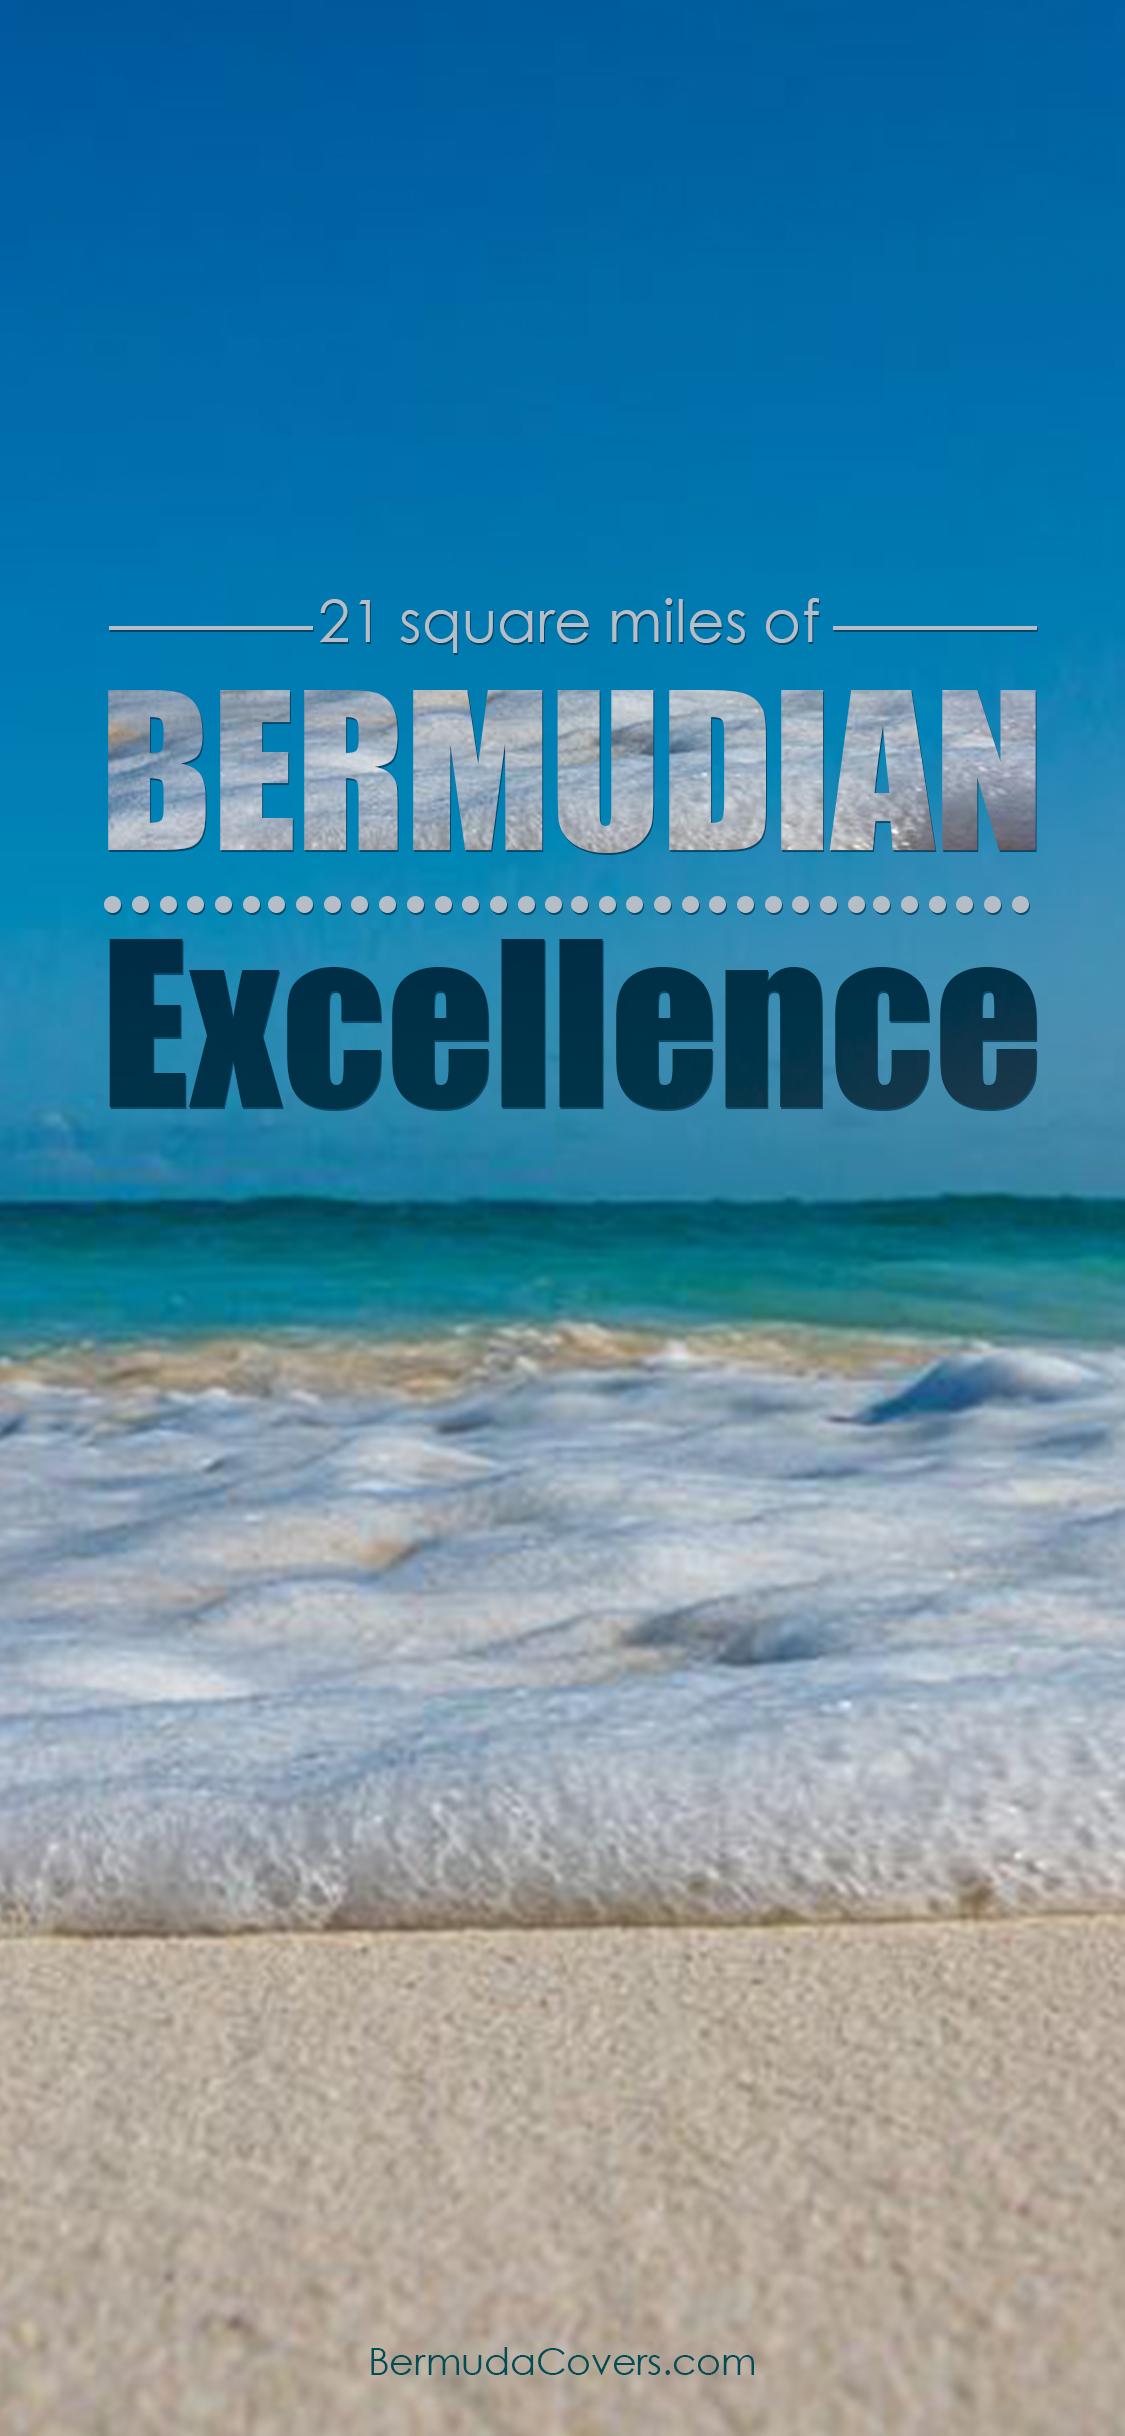 Bermudian Excellence Bernews Mobile Phone Wallpaper Lock Screen Design Image Photo 190515 3